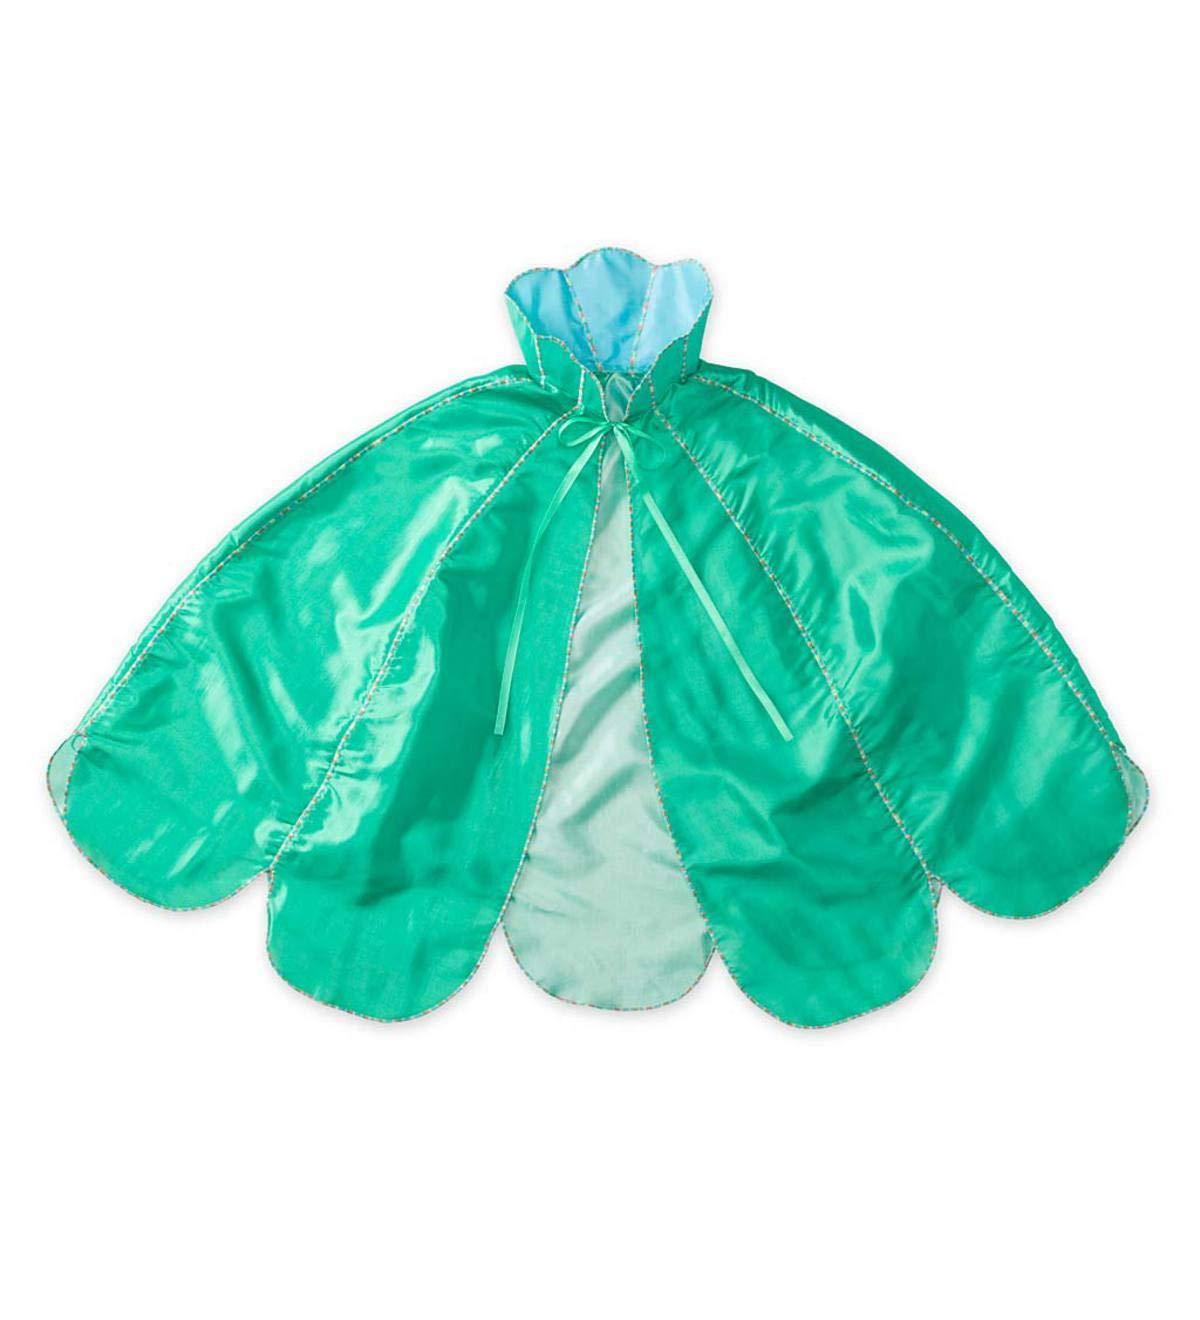 One Size Magic Cabin Pretend Play Costume Accessory Machine Washable Mermaid Dress Up Cloak for Kids